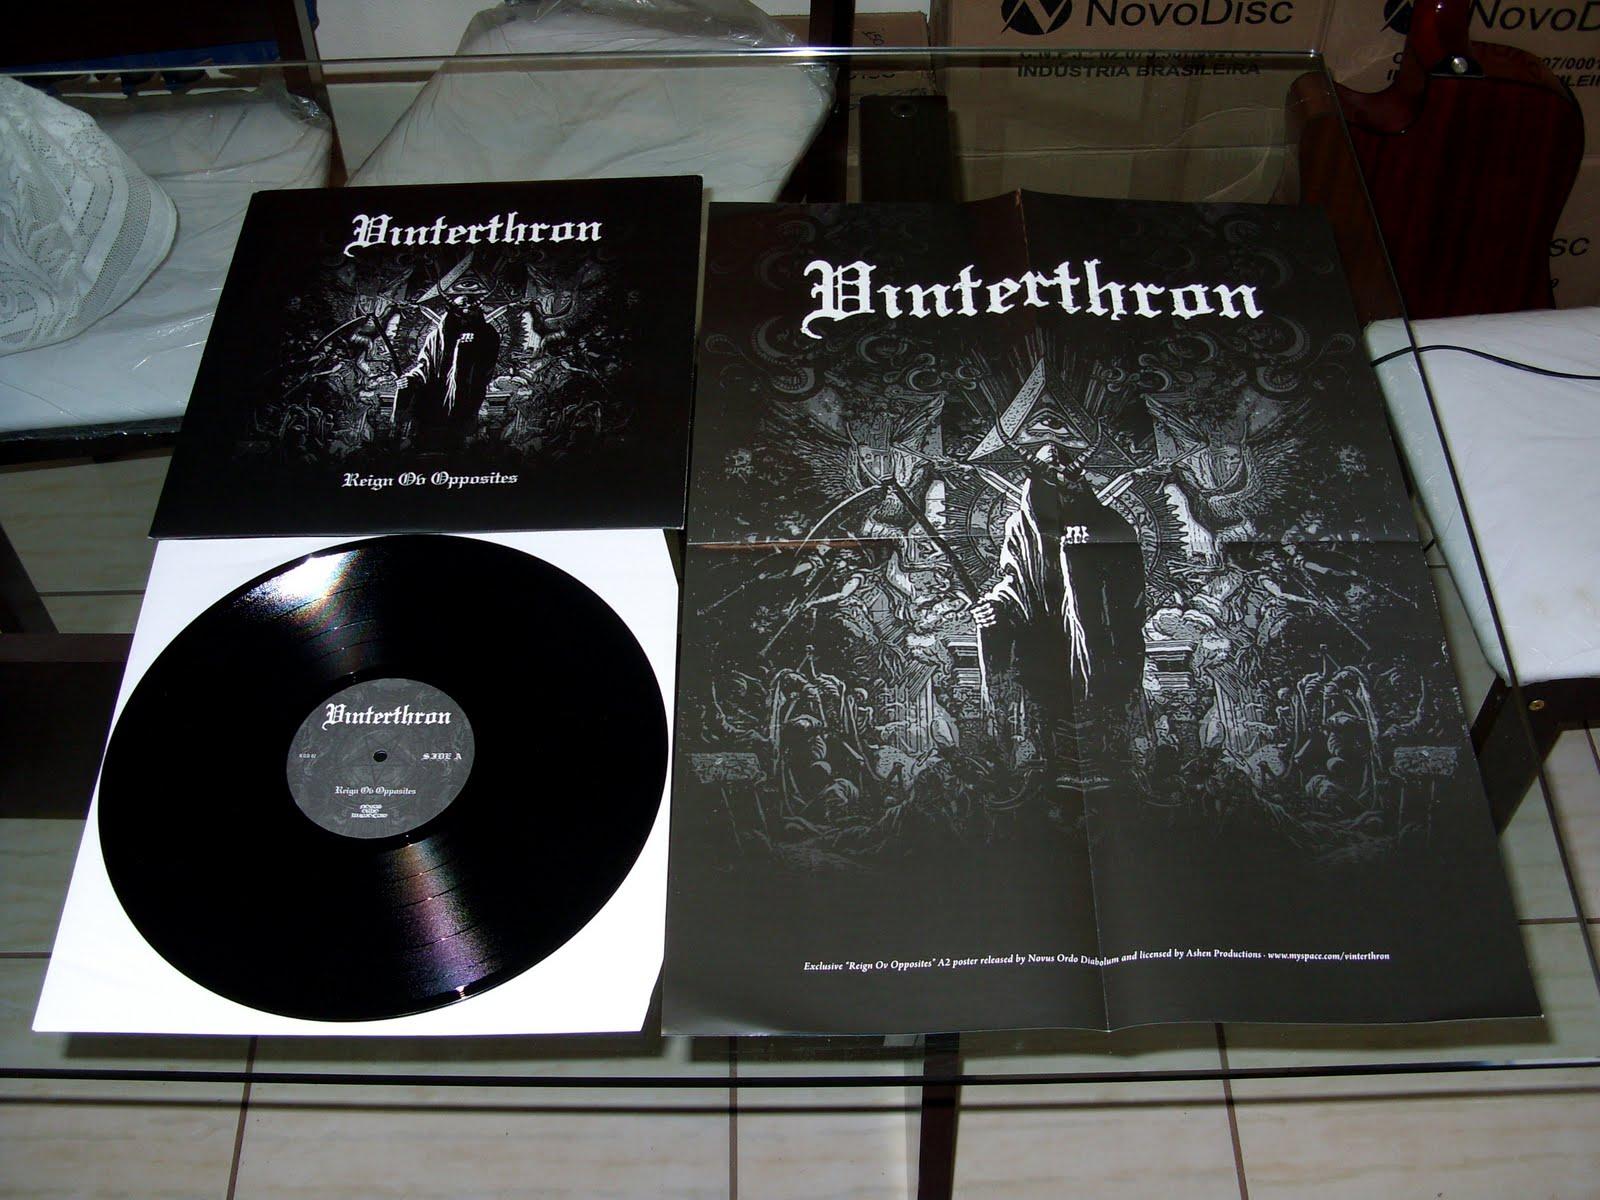 Vinterthron - Lp